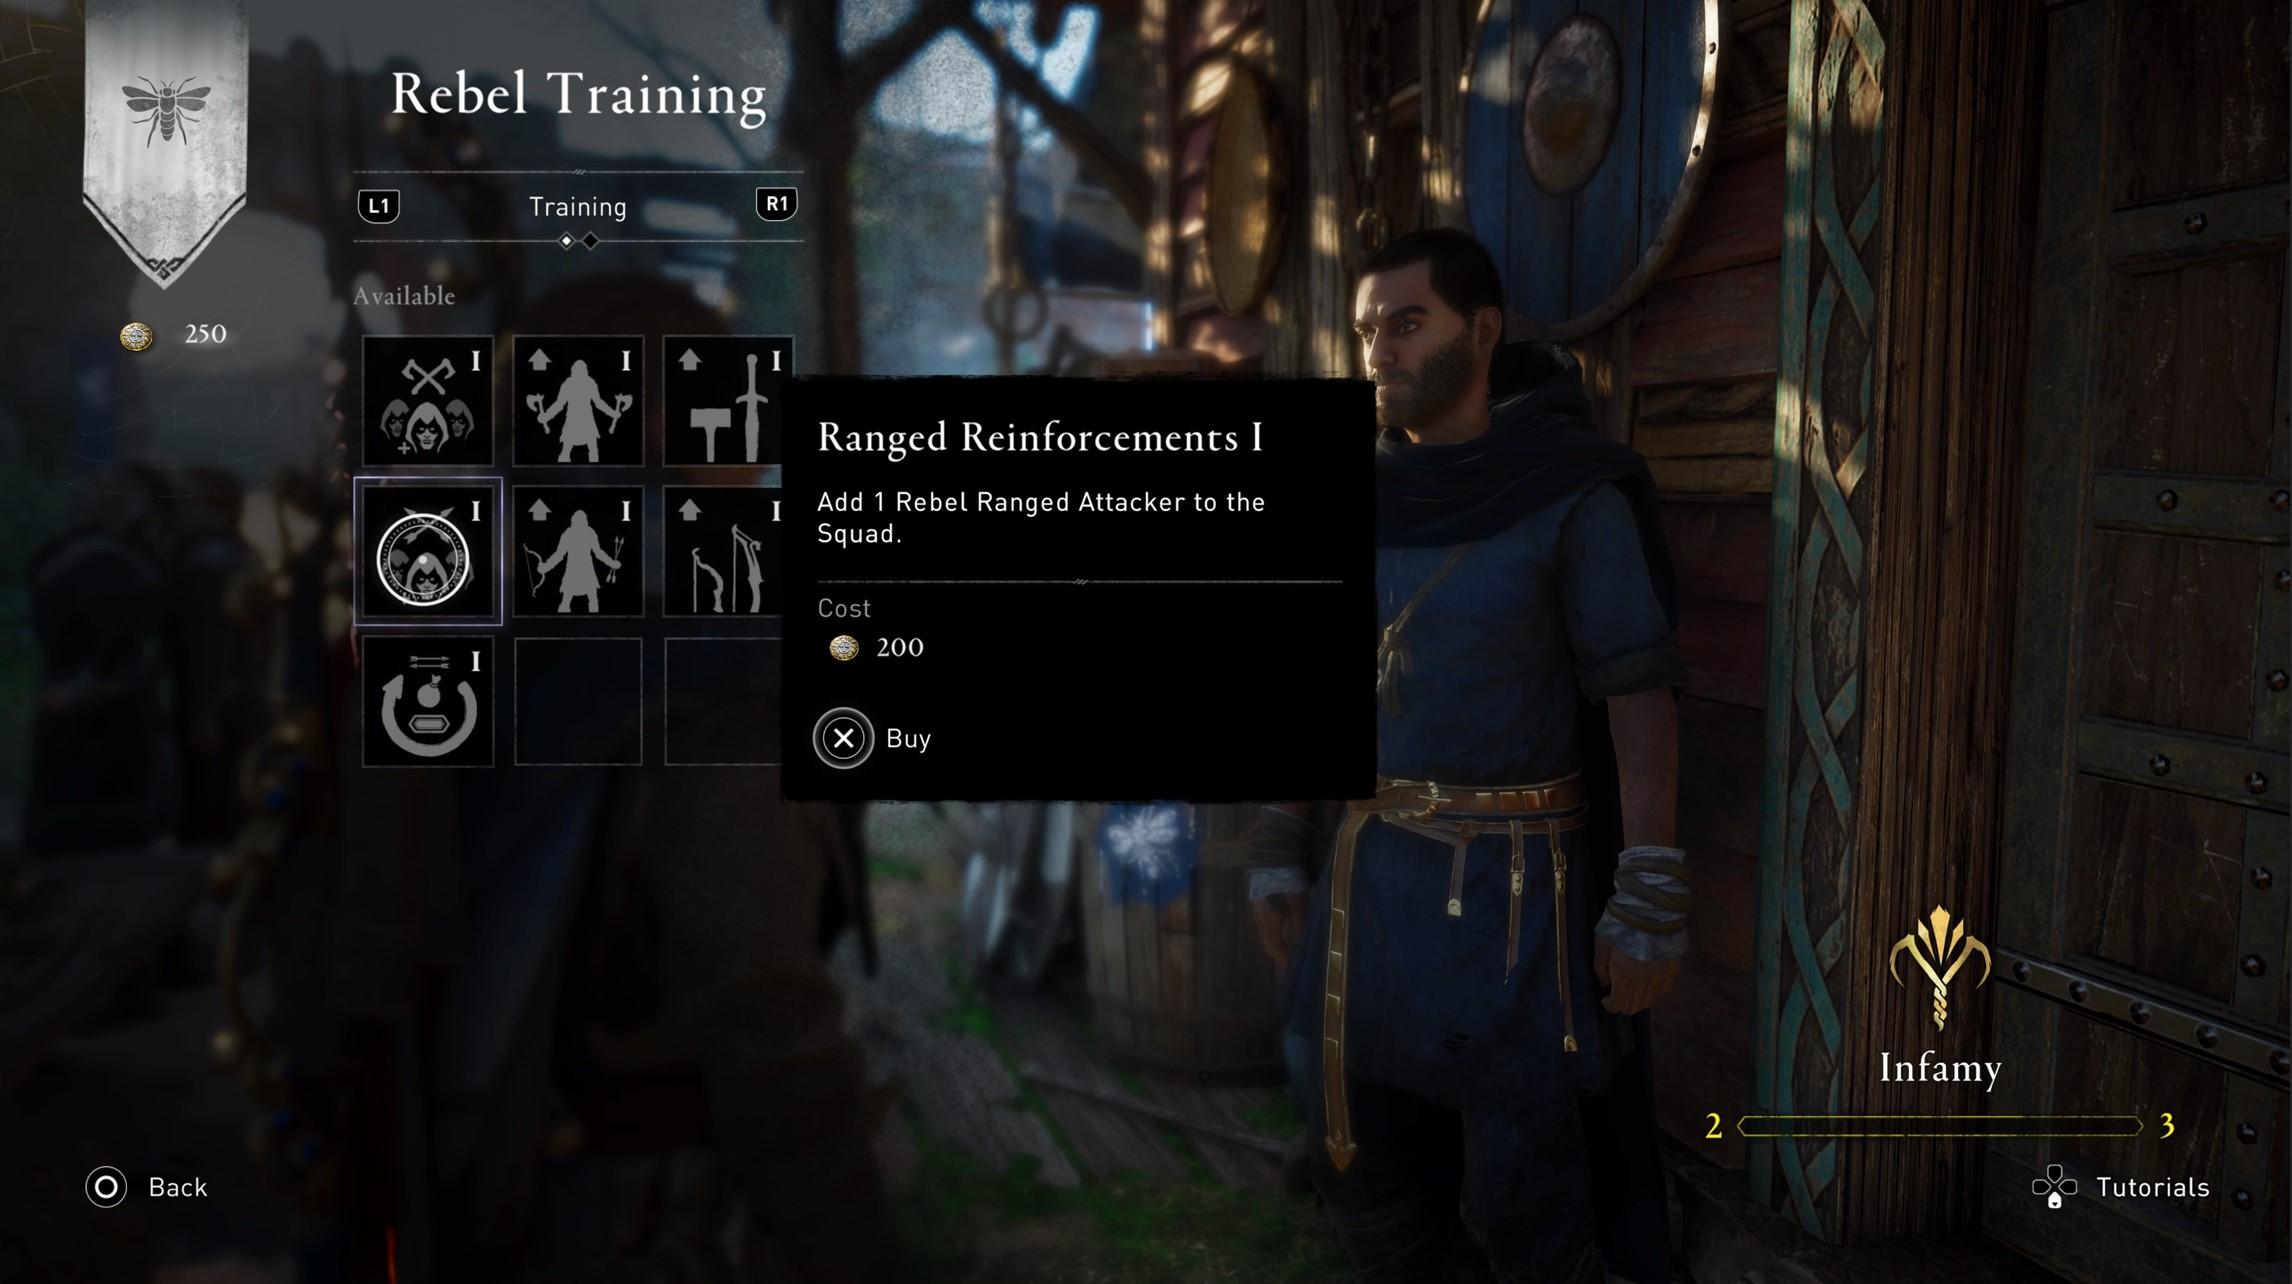 assassins creed valhalla siege of paris rebel mission Assassin's Creed Valhalla Siege of Paris DLC review